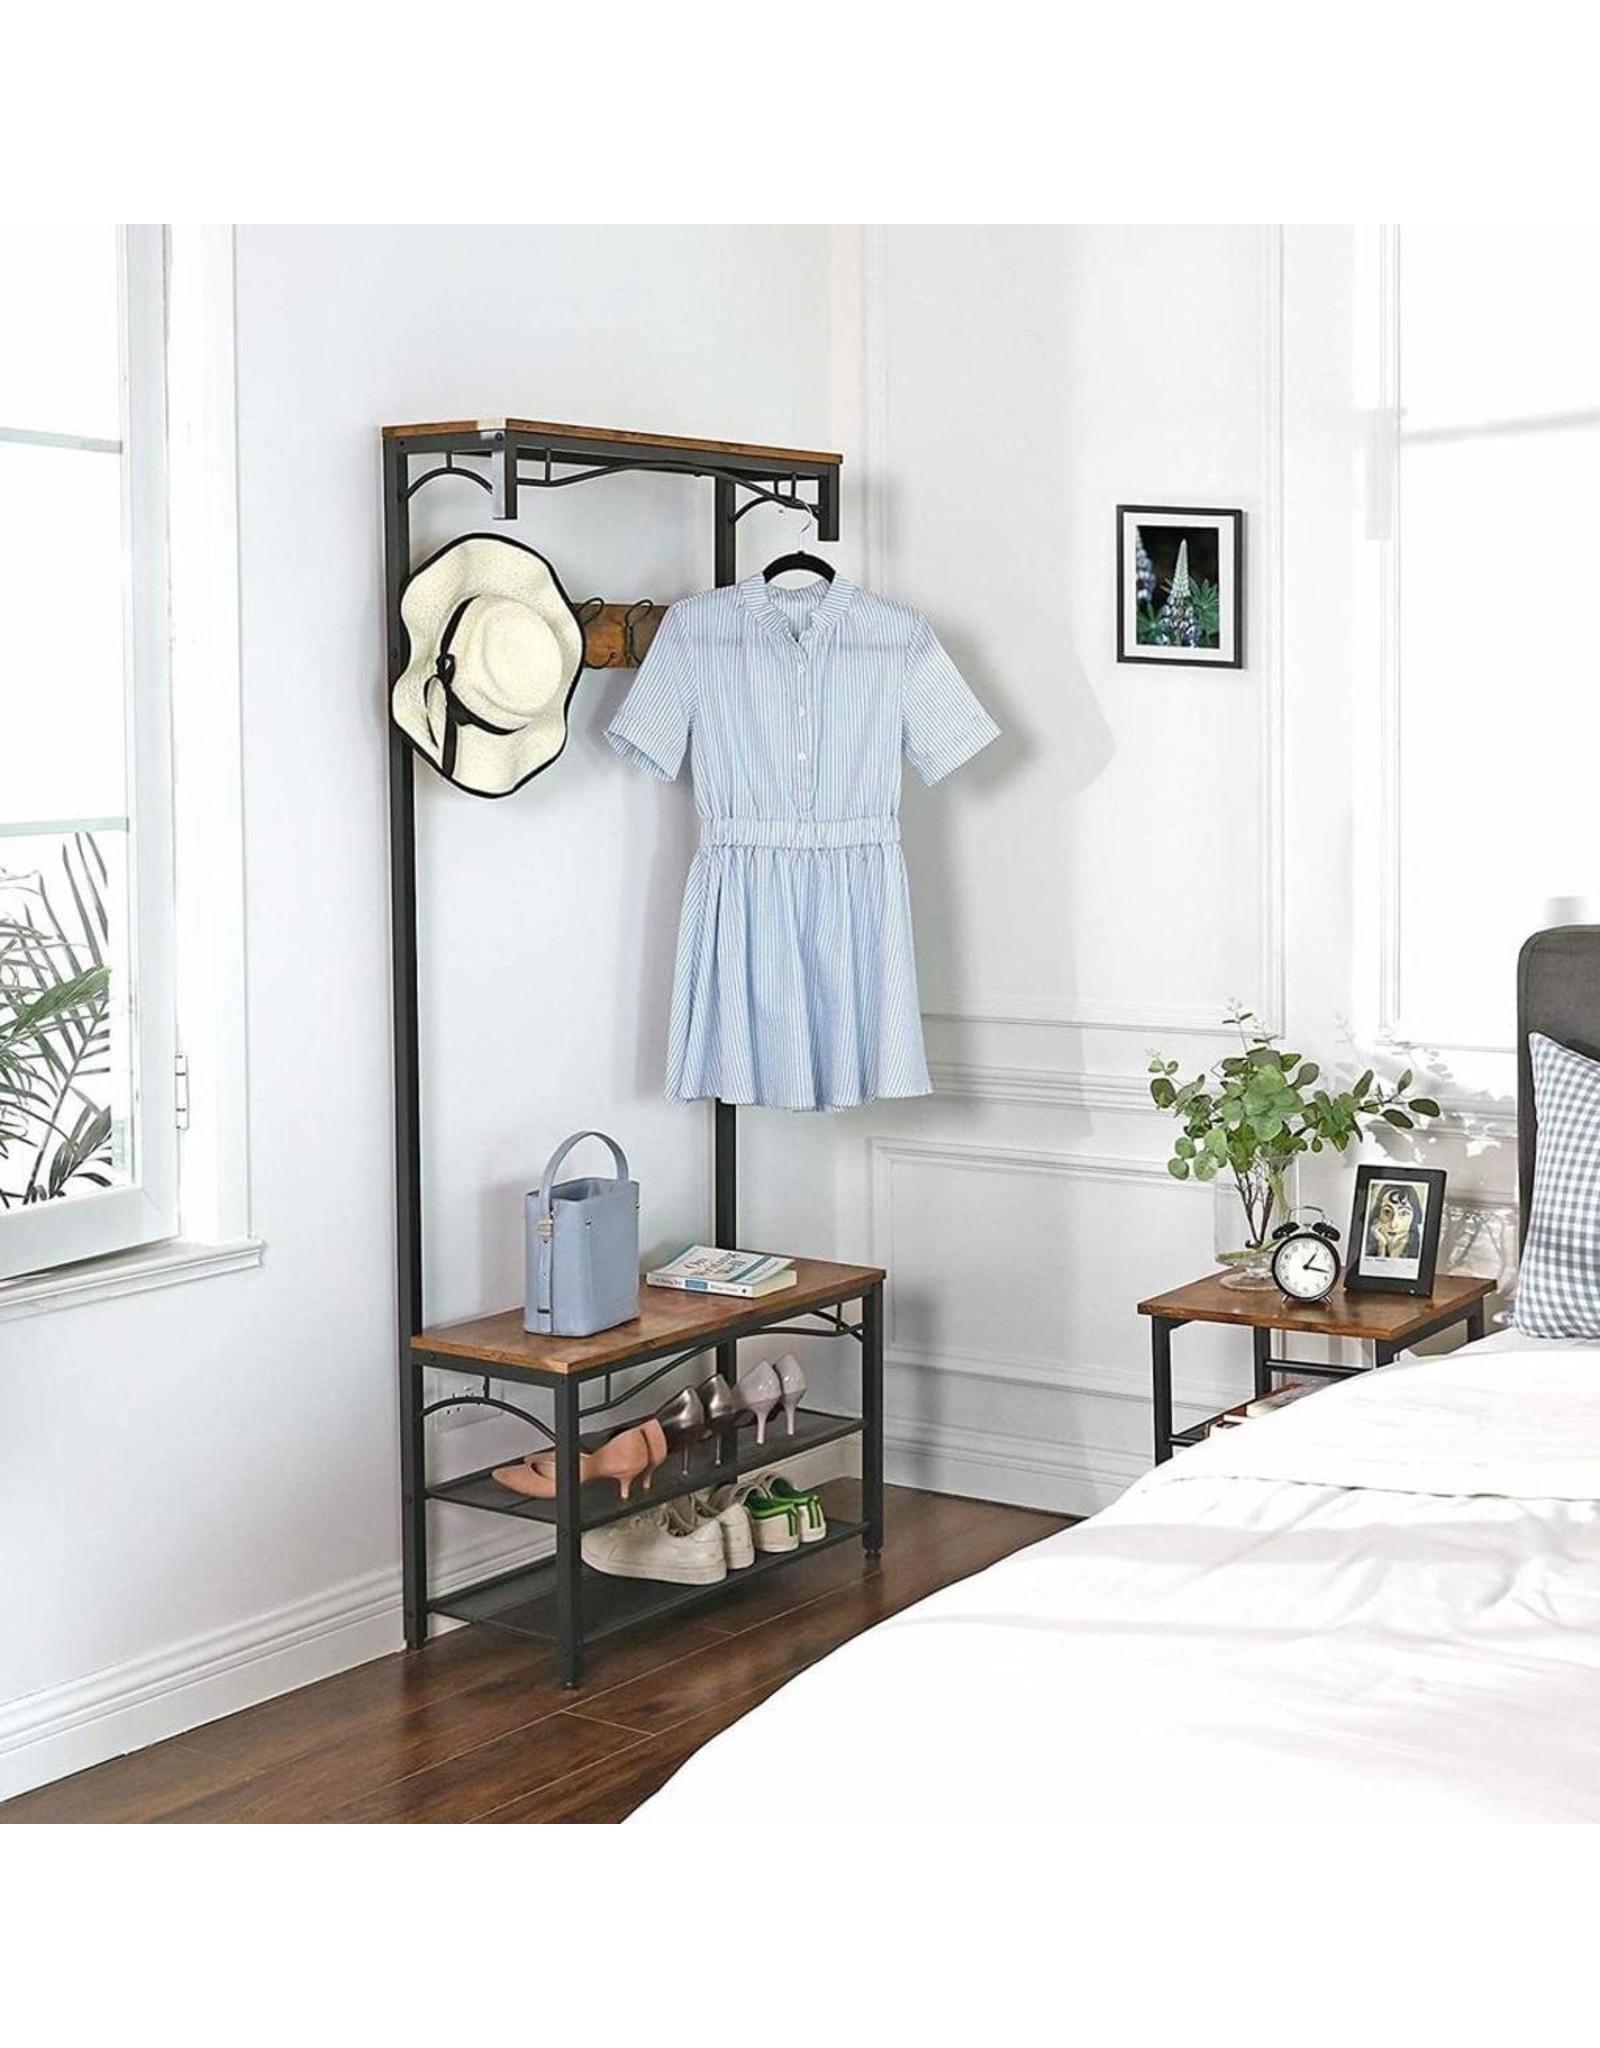 Parya Home Parya Home - Coatrack With 3 Shelves - Incl. shoe rack